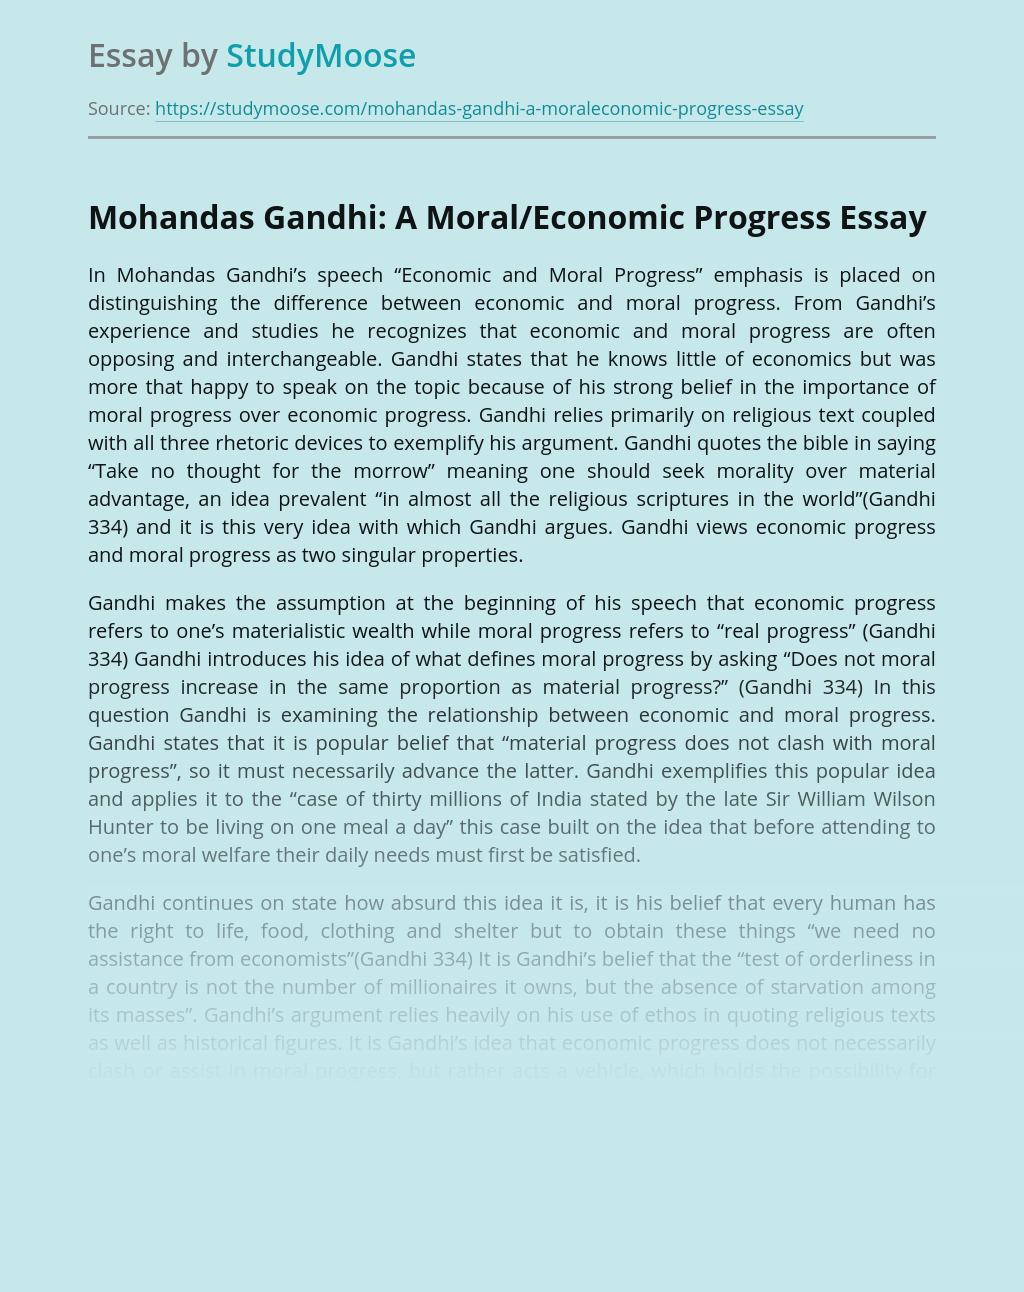 Mohandas Gandhi: A Moral/Economic Progress